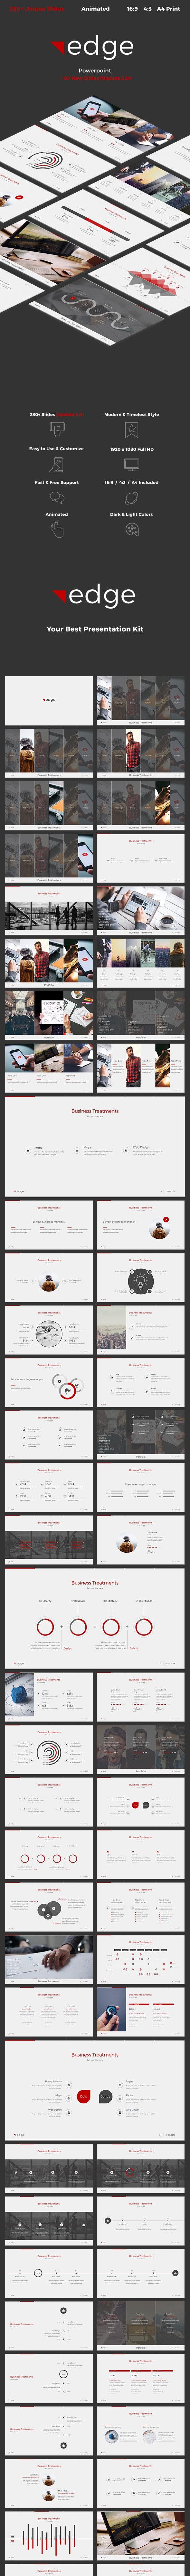 edge Powerpoint - PowerPoint Templates Presentation Templates